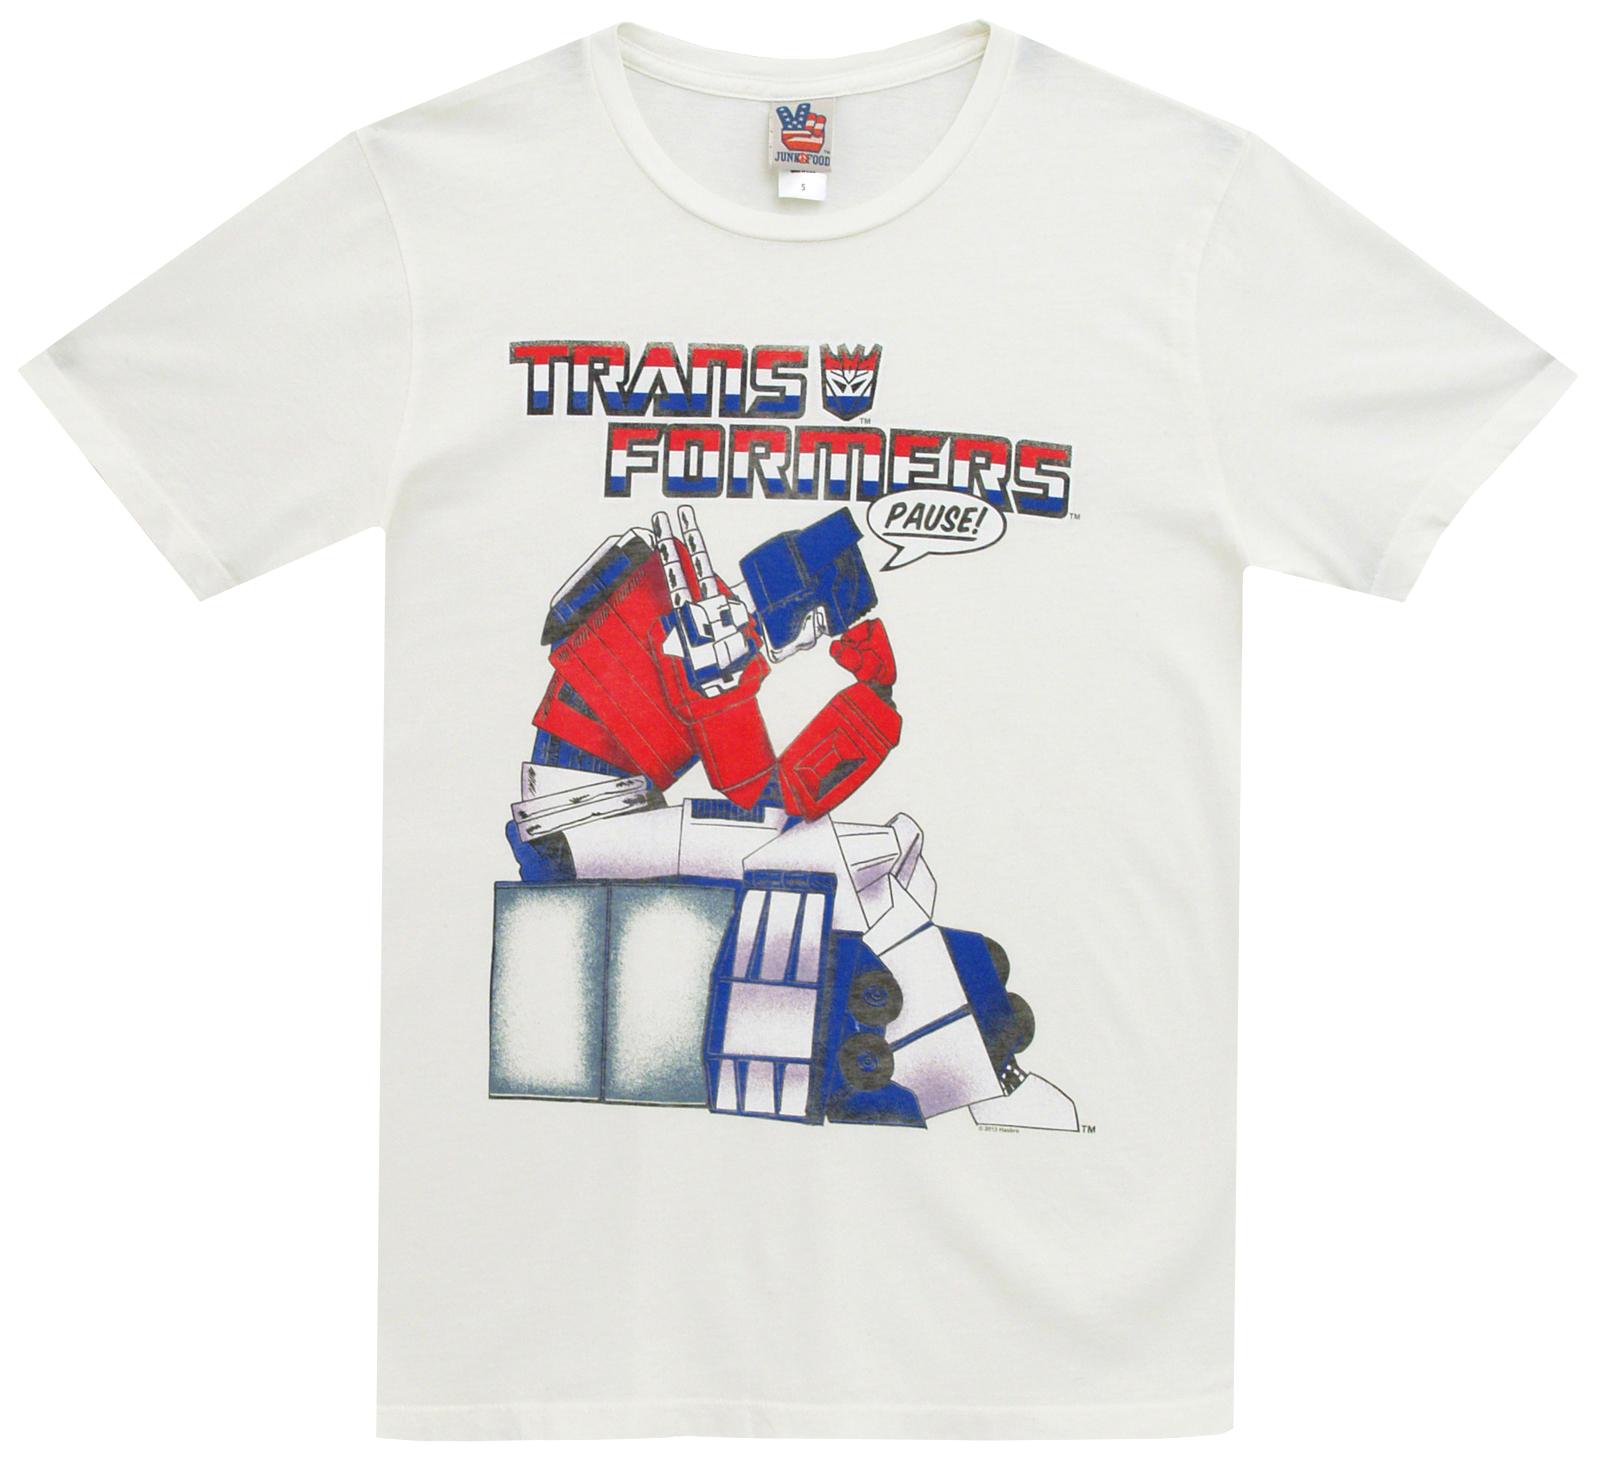 NWT GAP Junk Food Transformers Cartoon graphic Tee T-Shirt Shirt Tees XXL 14 16